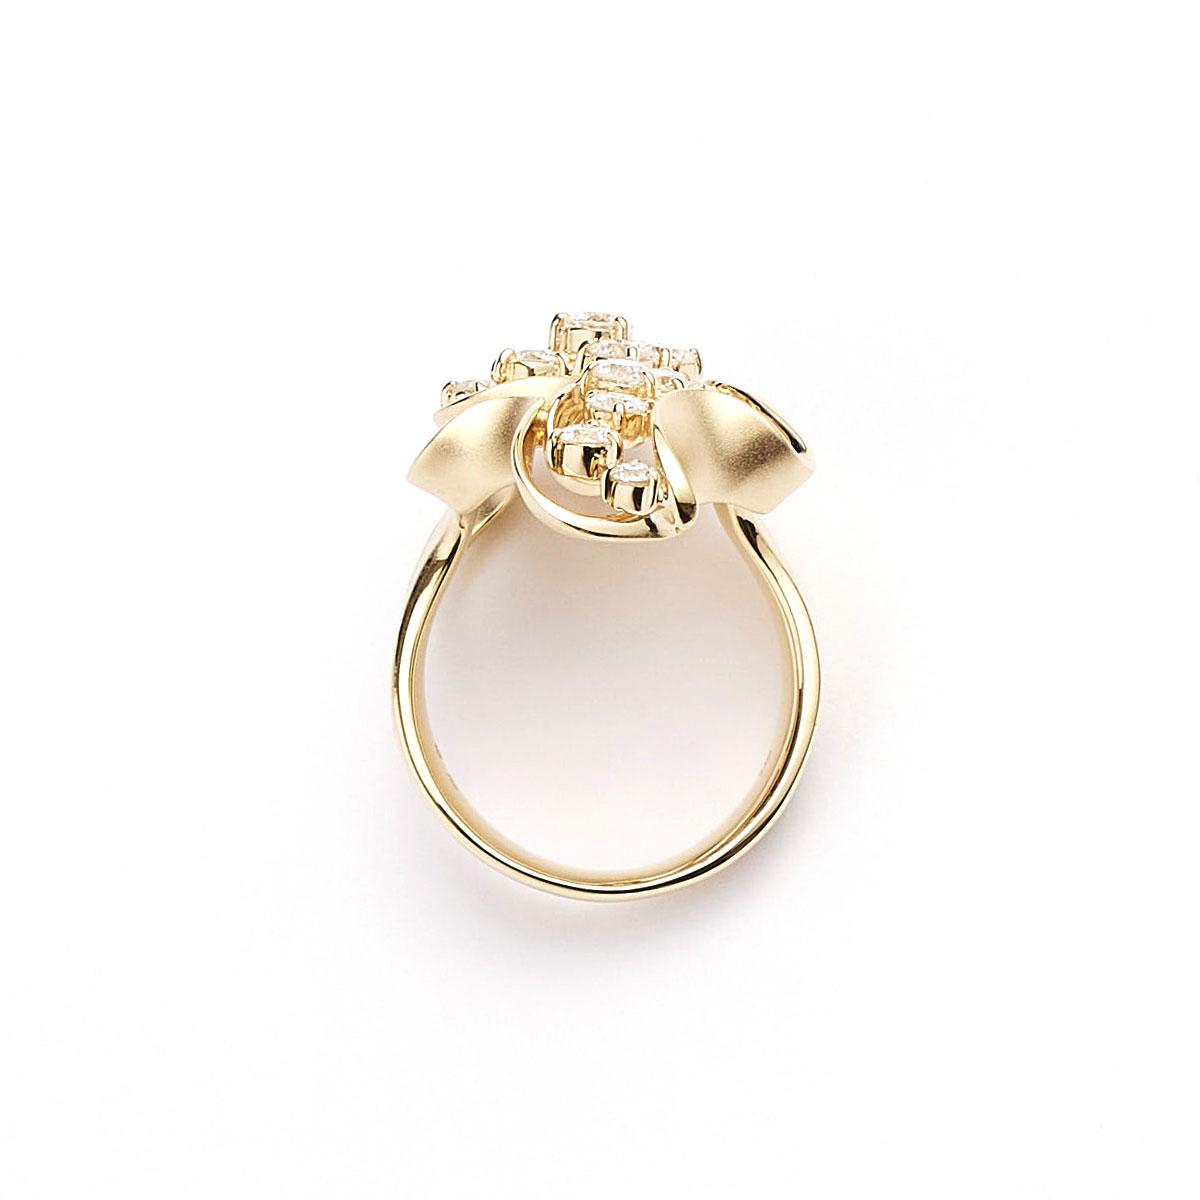 K18 2.0ctDiamond Ring